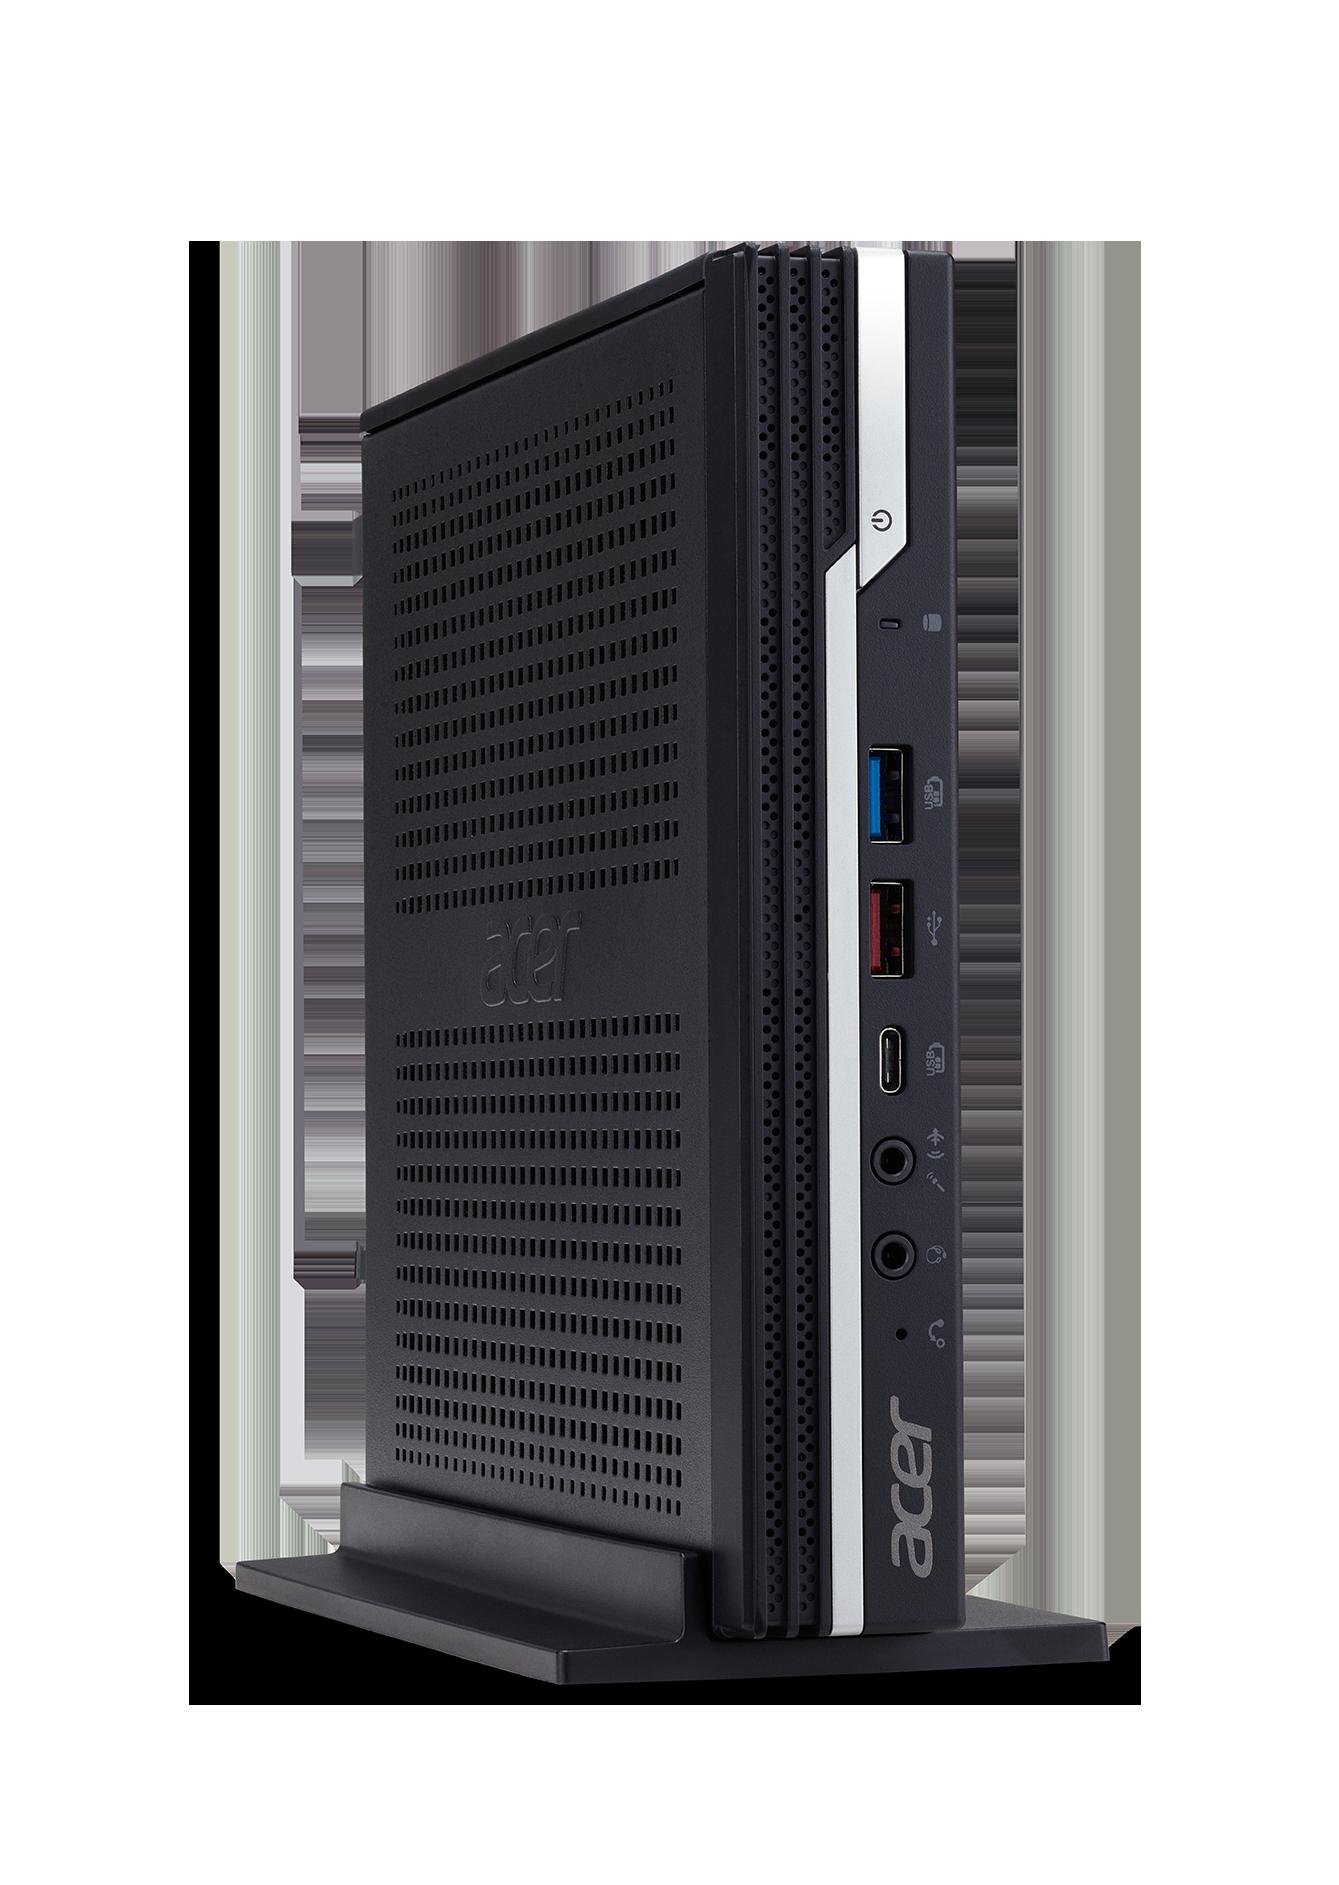 Acer Veriton N (VN4670GT) - 15-10400T/256SSD/8G/W10Pro + 2 roky